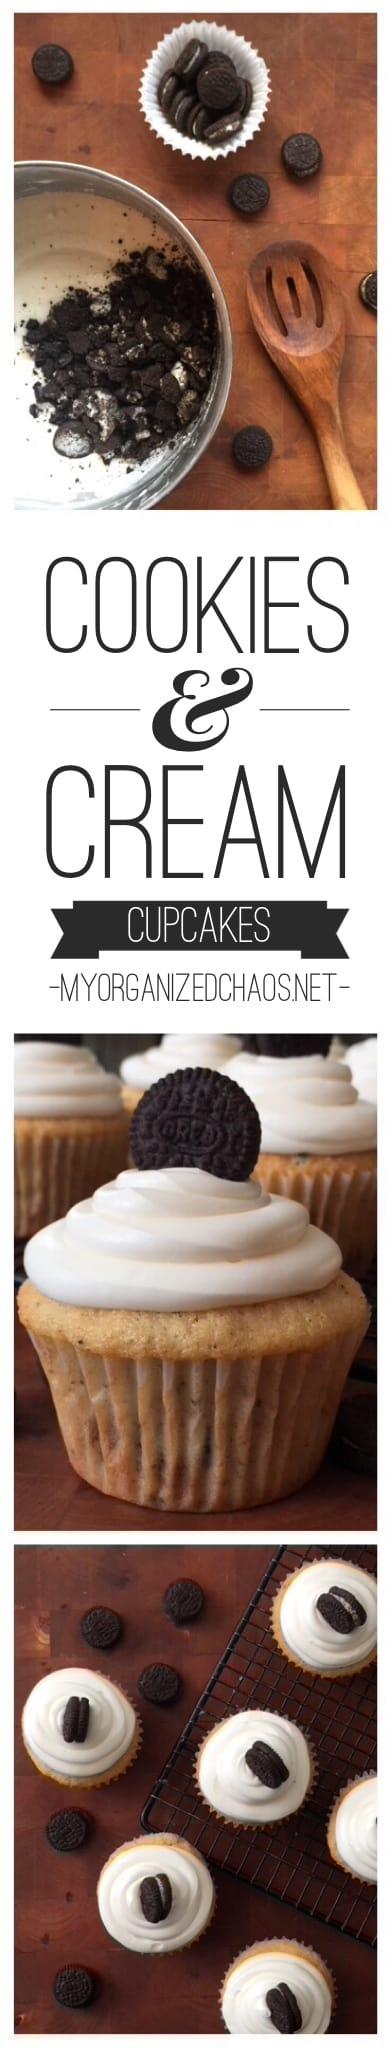 cookies and cream cupcakes oreo